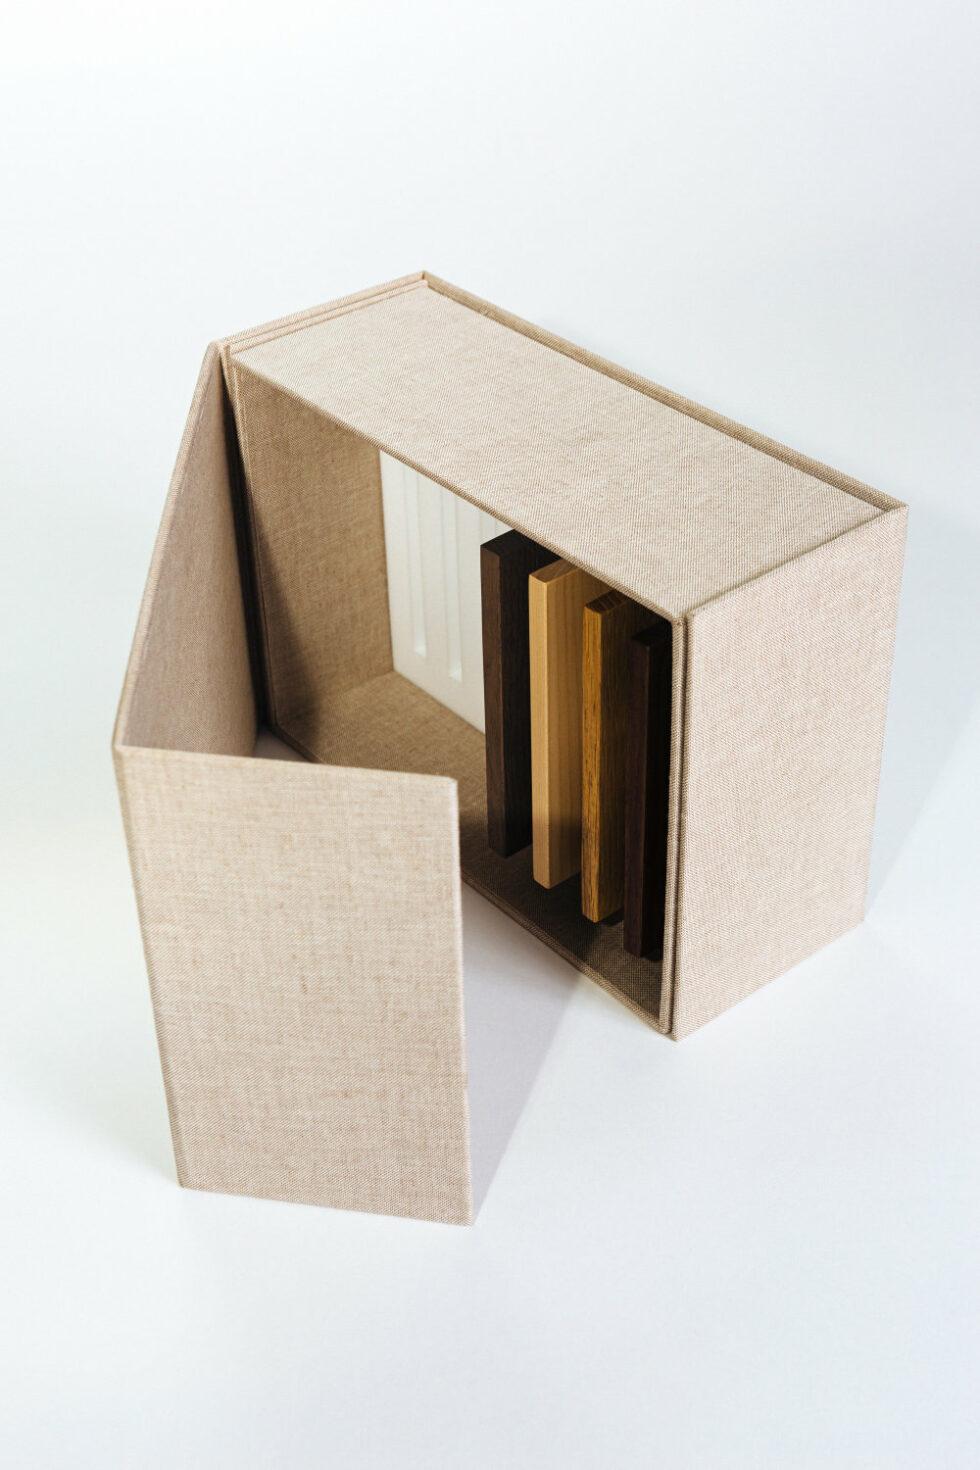 echantillons-MP-030719-0348-ed-1500px